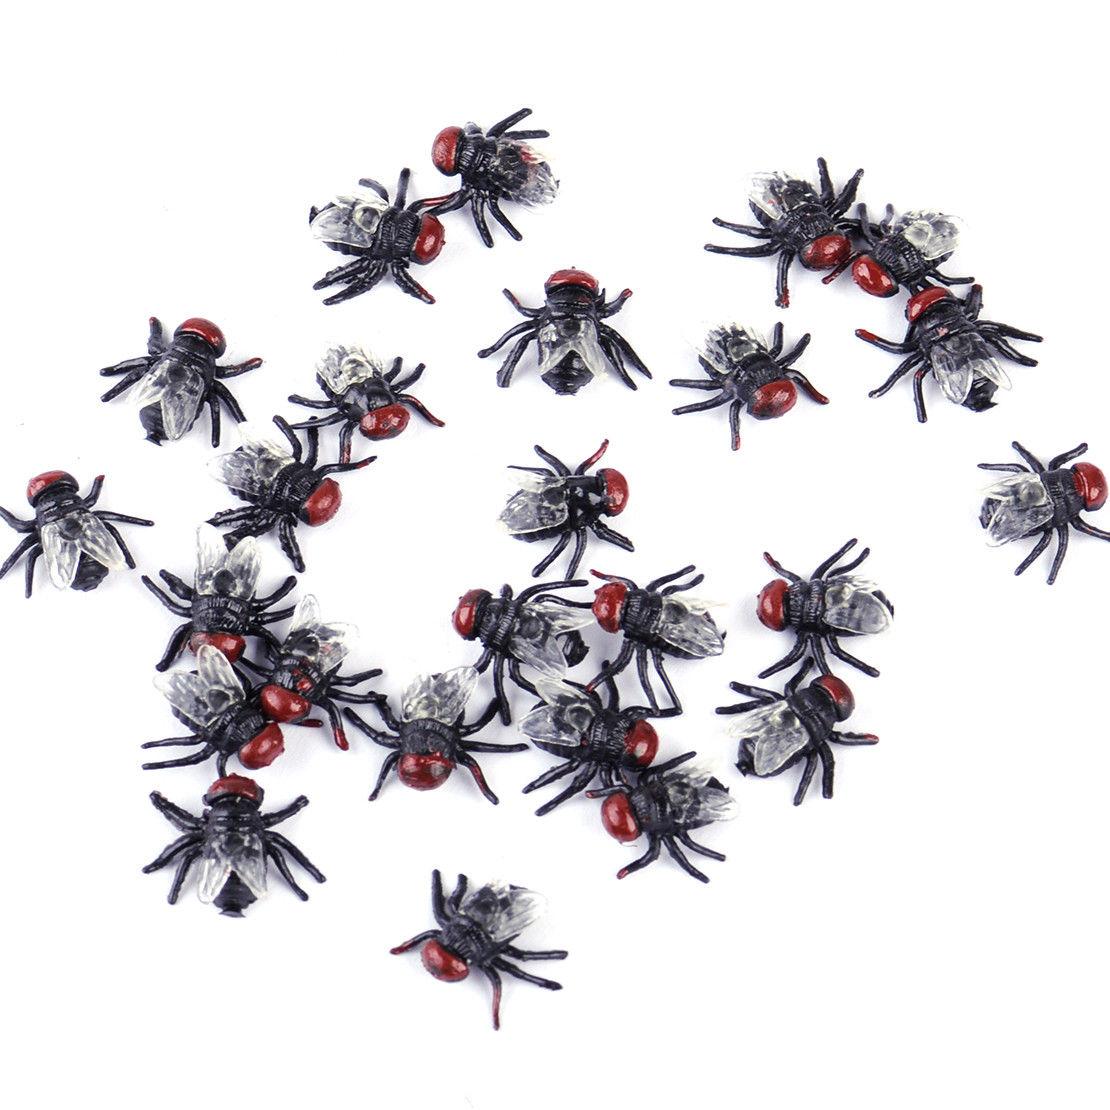 100X Joke Flies Bug Funny Prank Novelty Fake Toy Trick Party Horror ...